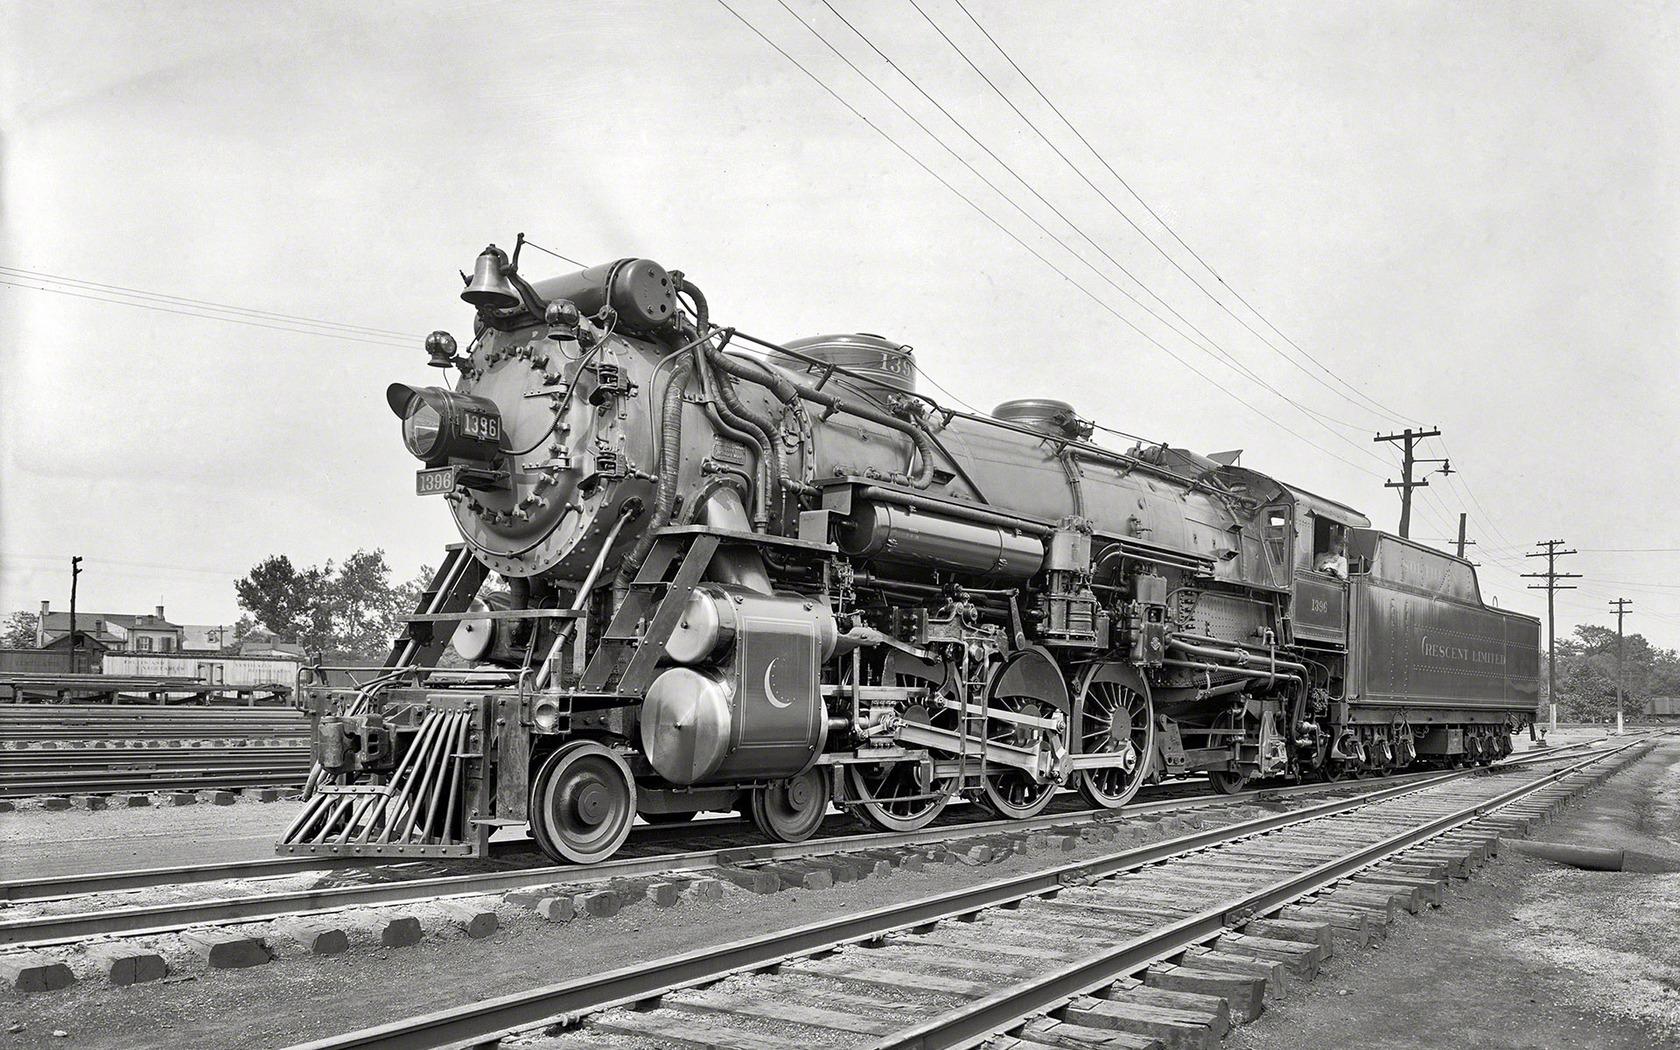 Vintage train wallpaper 17791 1680x1050